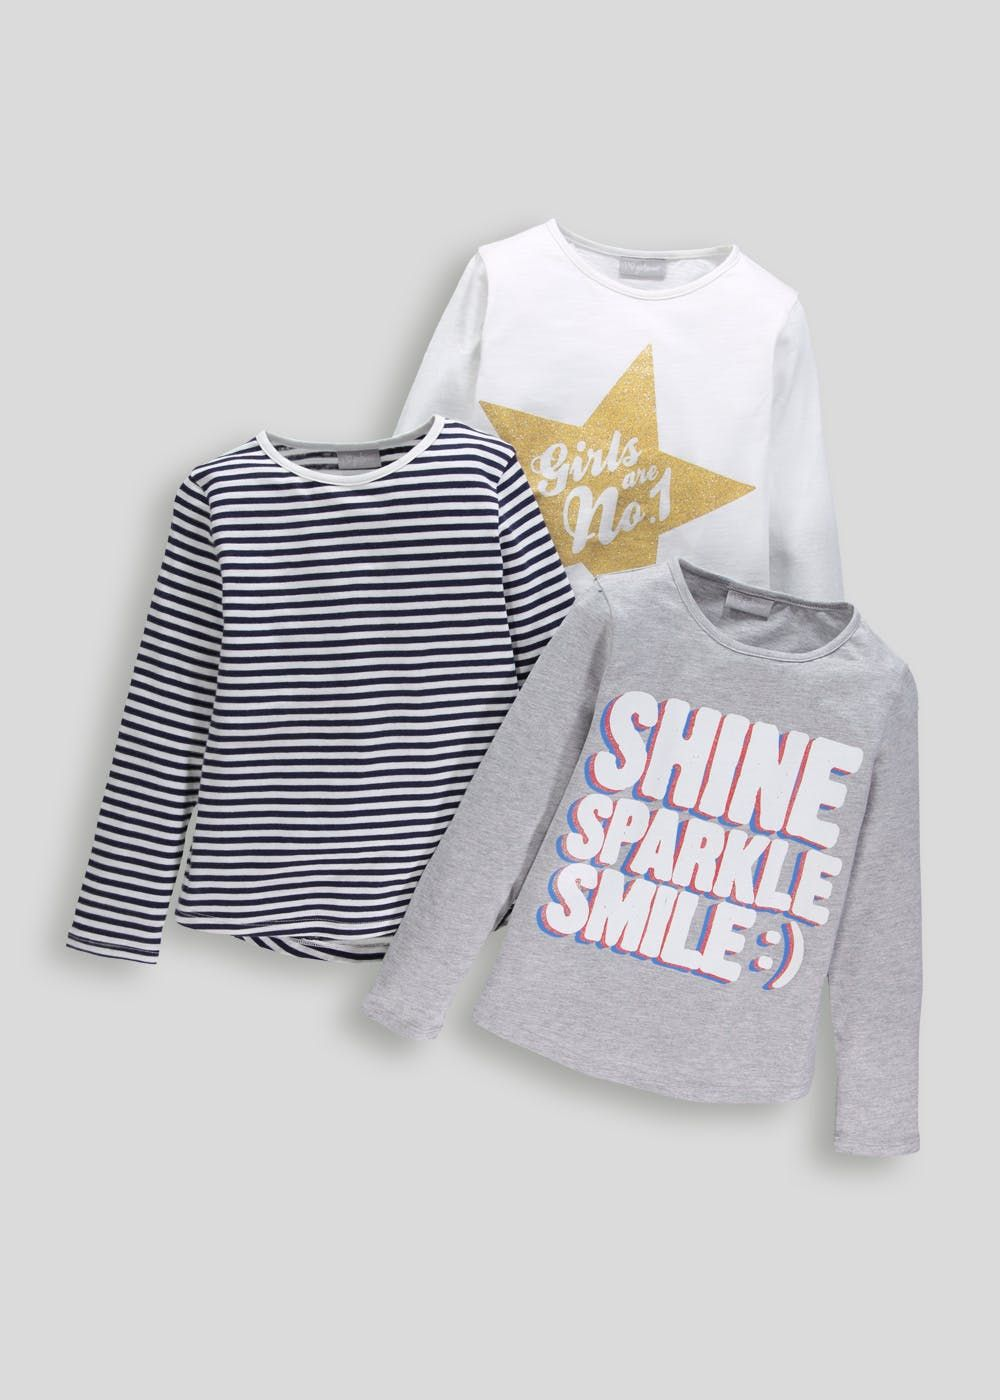 8f70e2e2c1002e Girls 3 Pack Long Sleeve T-Shirts (4-13yrs) – White | W20 | Tops ...